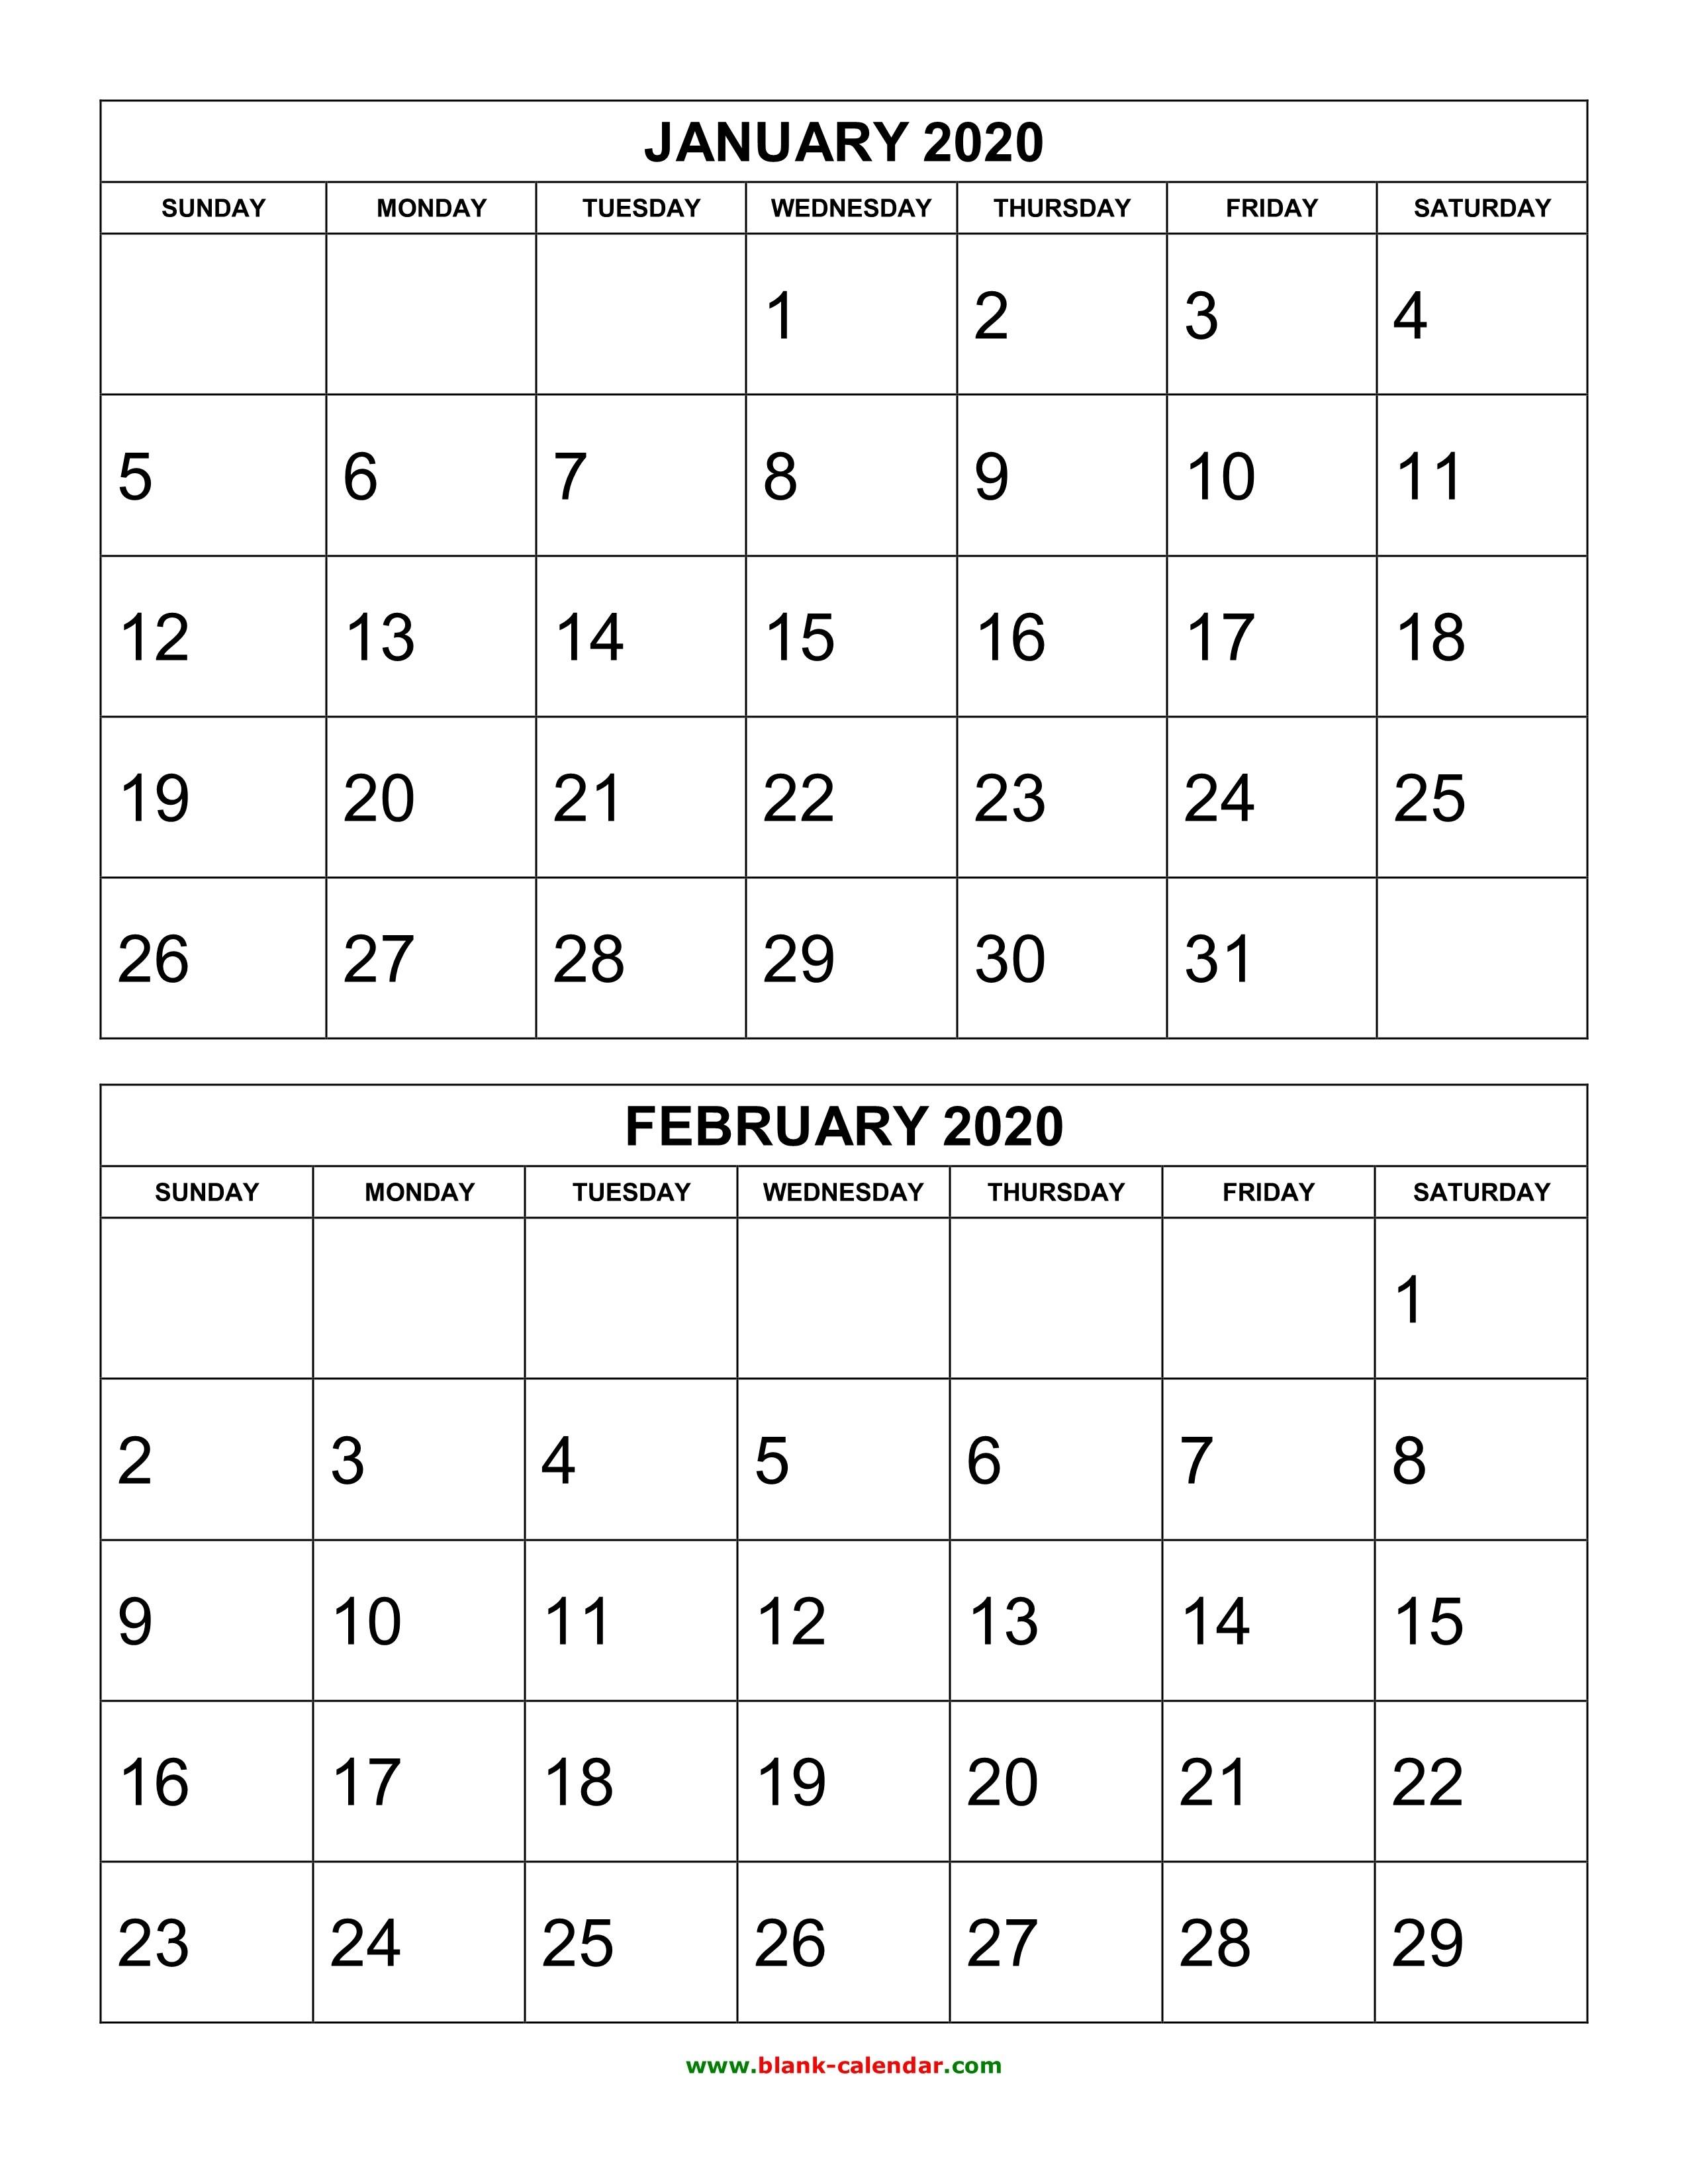 Free Download Printable Calendar 2020, 2 Months Per Page, 6-2 Page Monthly Calendar Printable 2020